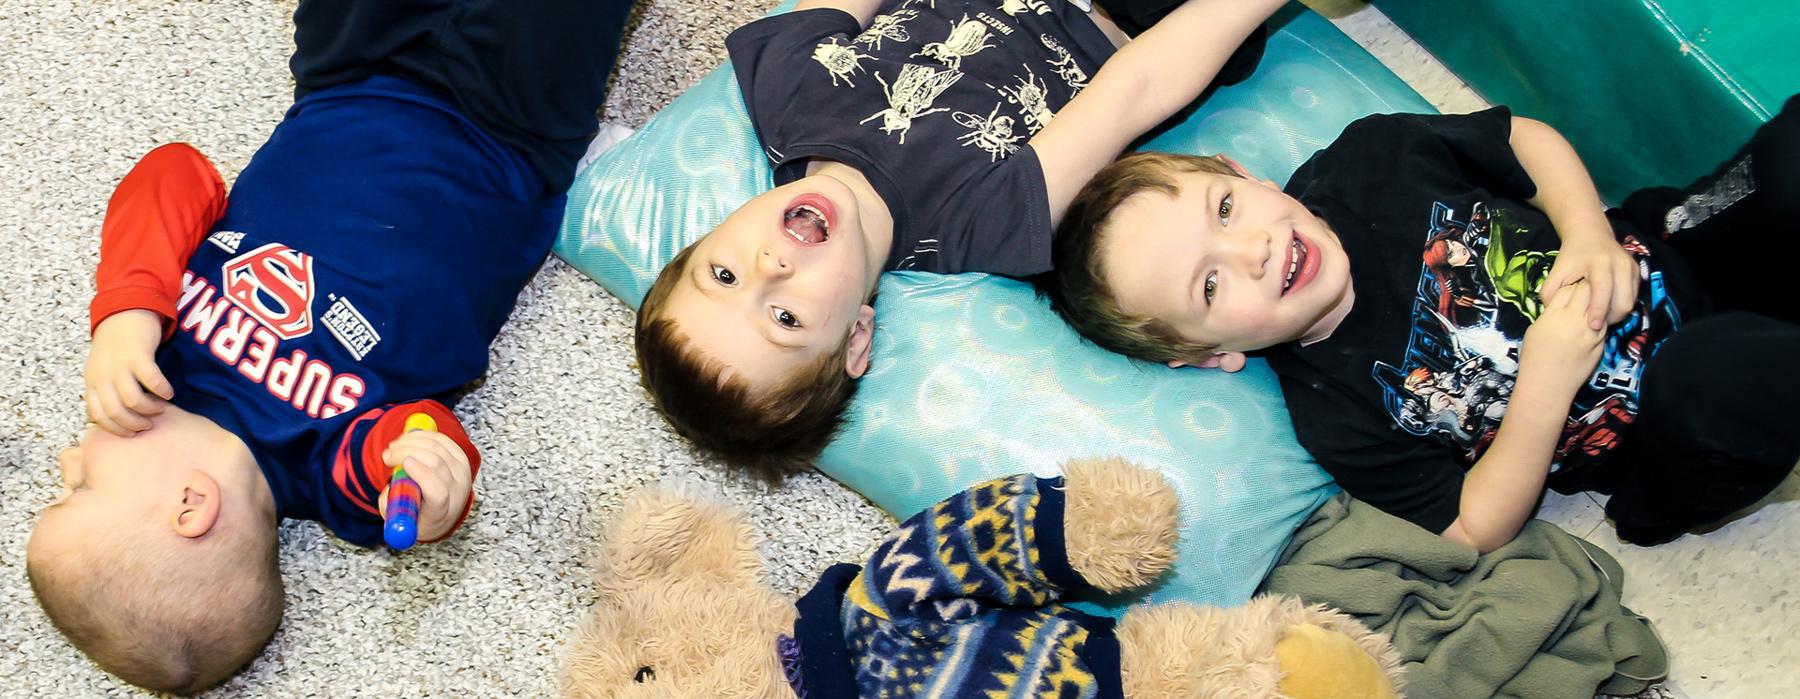 Boys lying on carpet